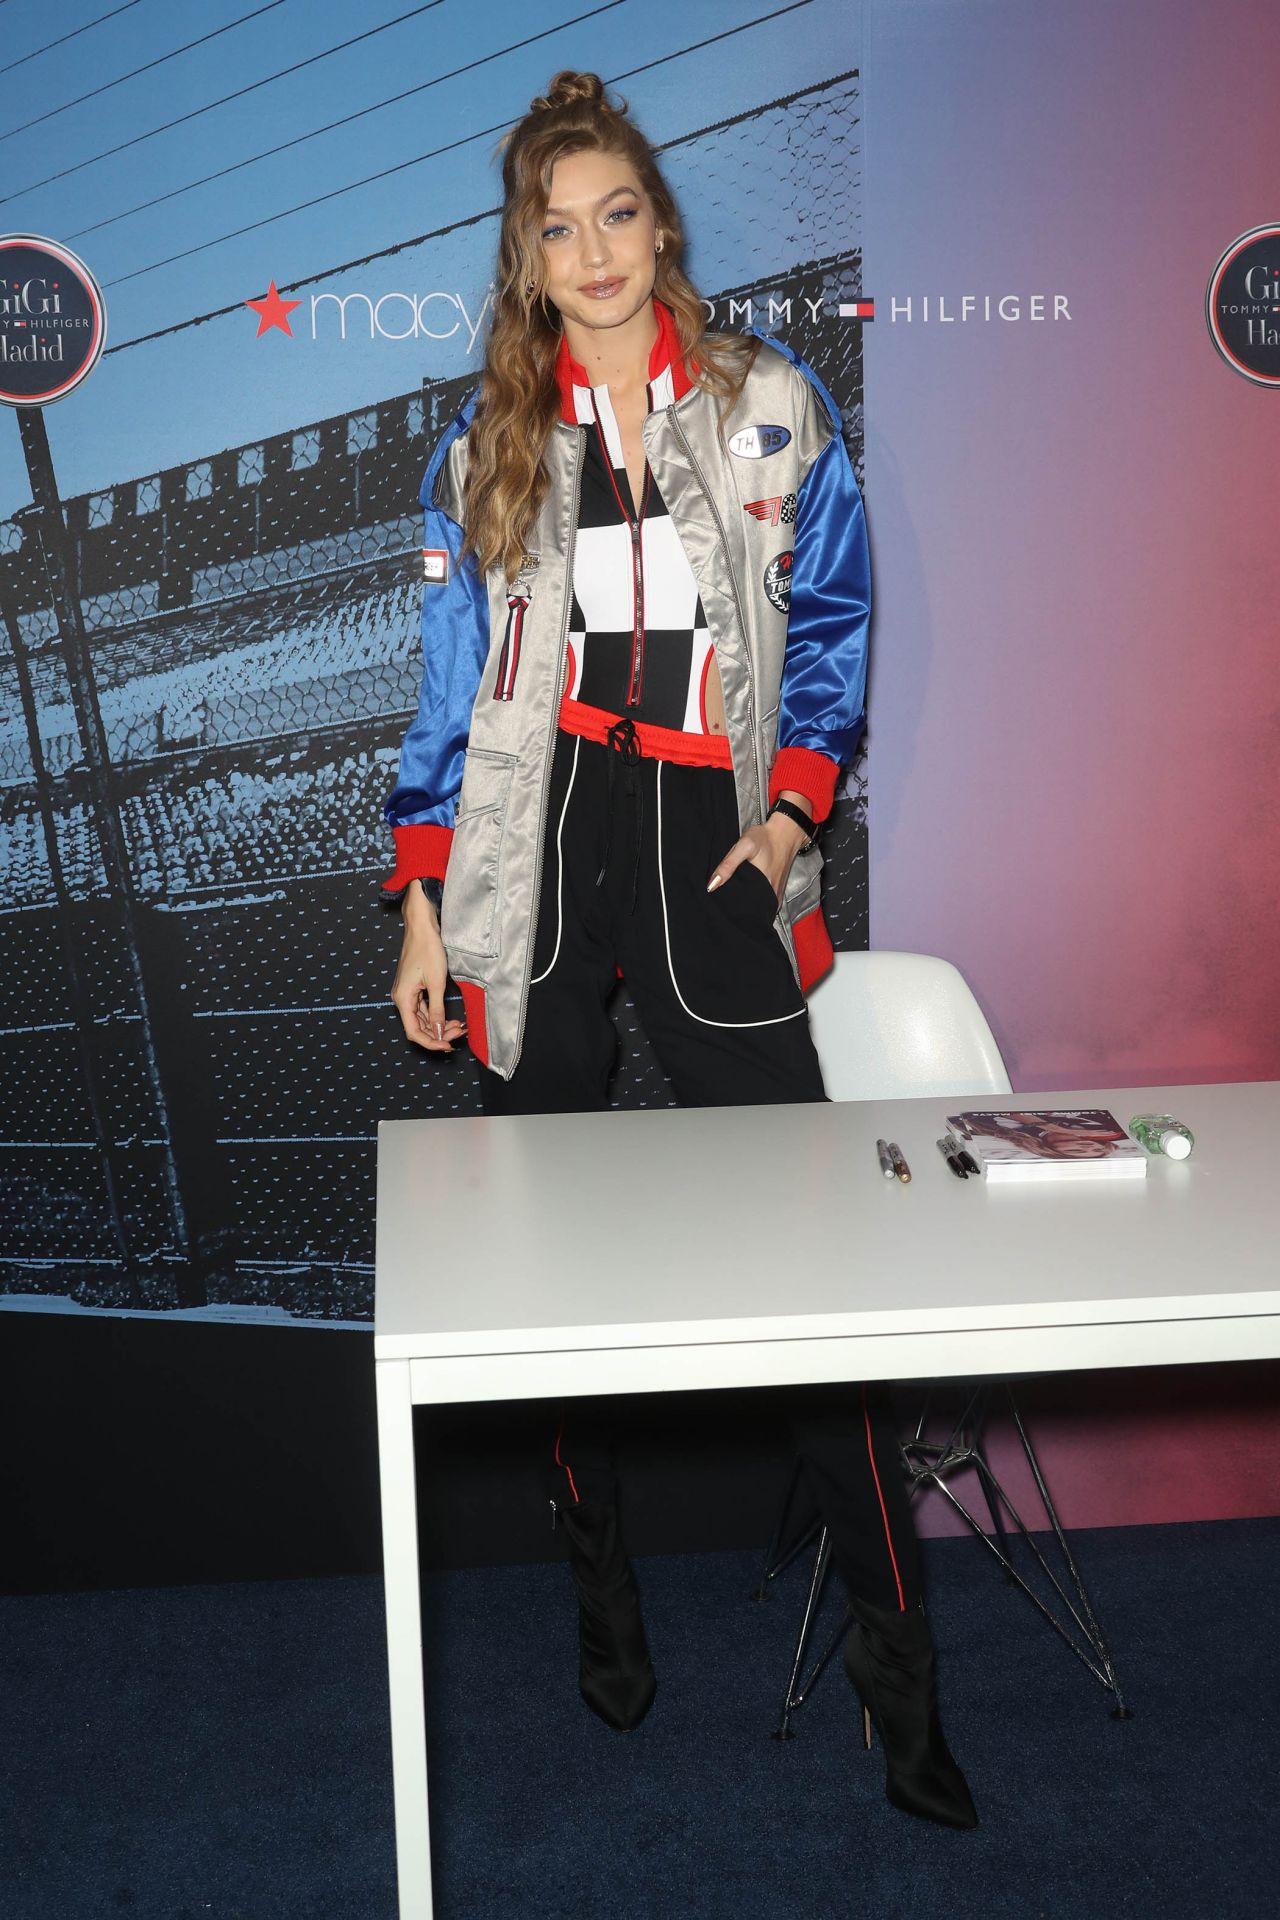 fb66bf213526 Gigi Hadid - Gigi Hadid x Tommy Hilfiger Watch Collection Launch in NYC 04  26 2018